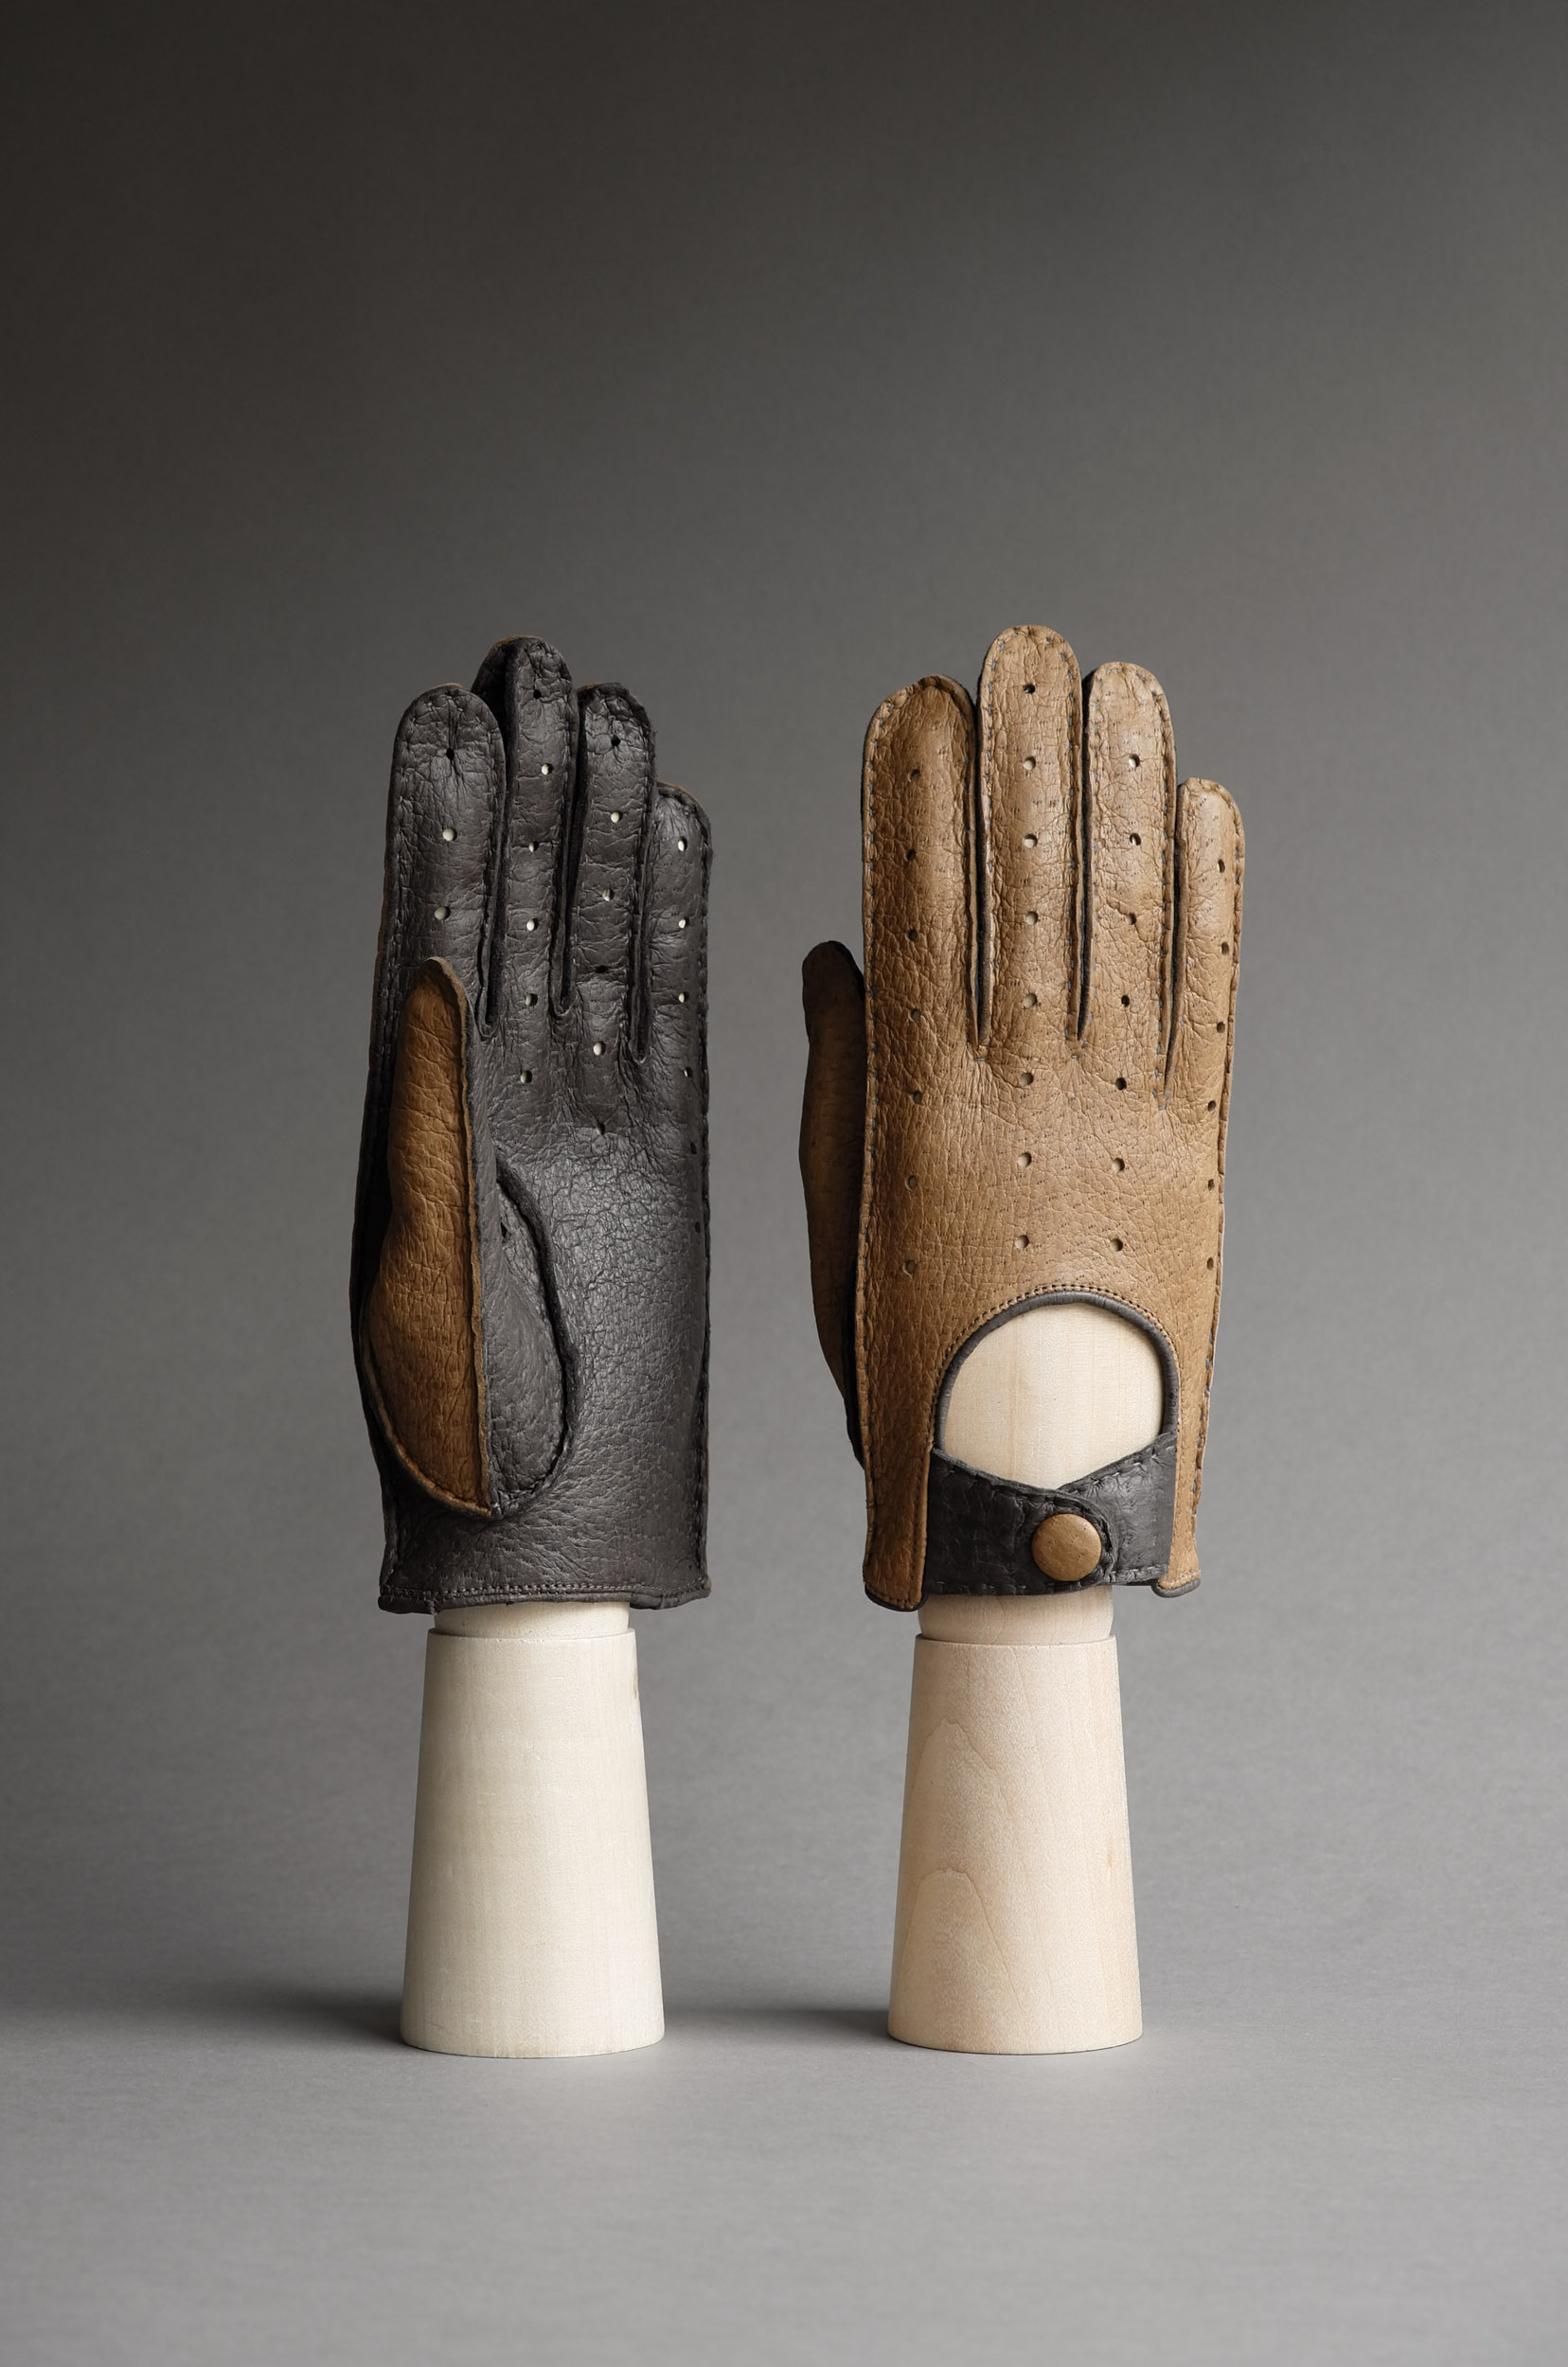 Thomas Riemer peccary driving gloves